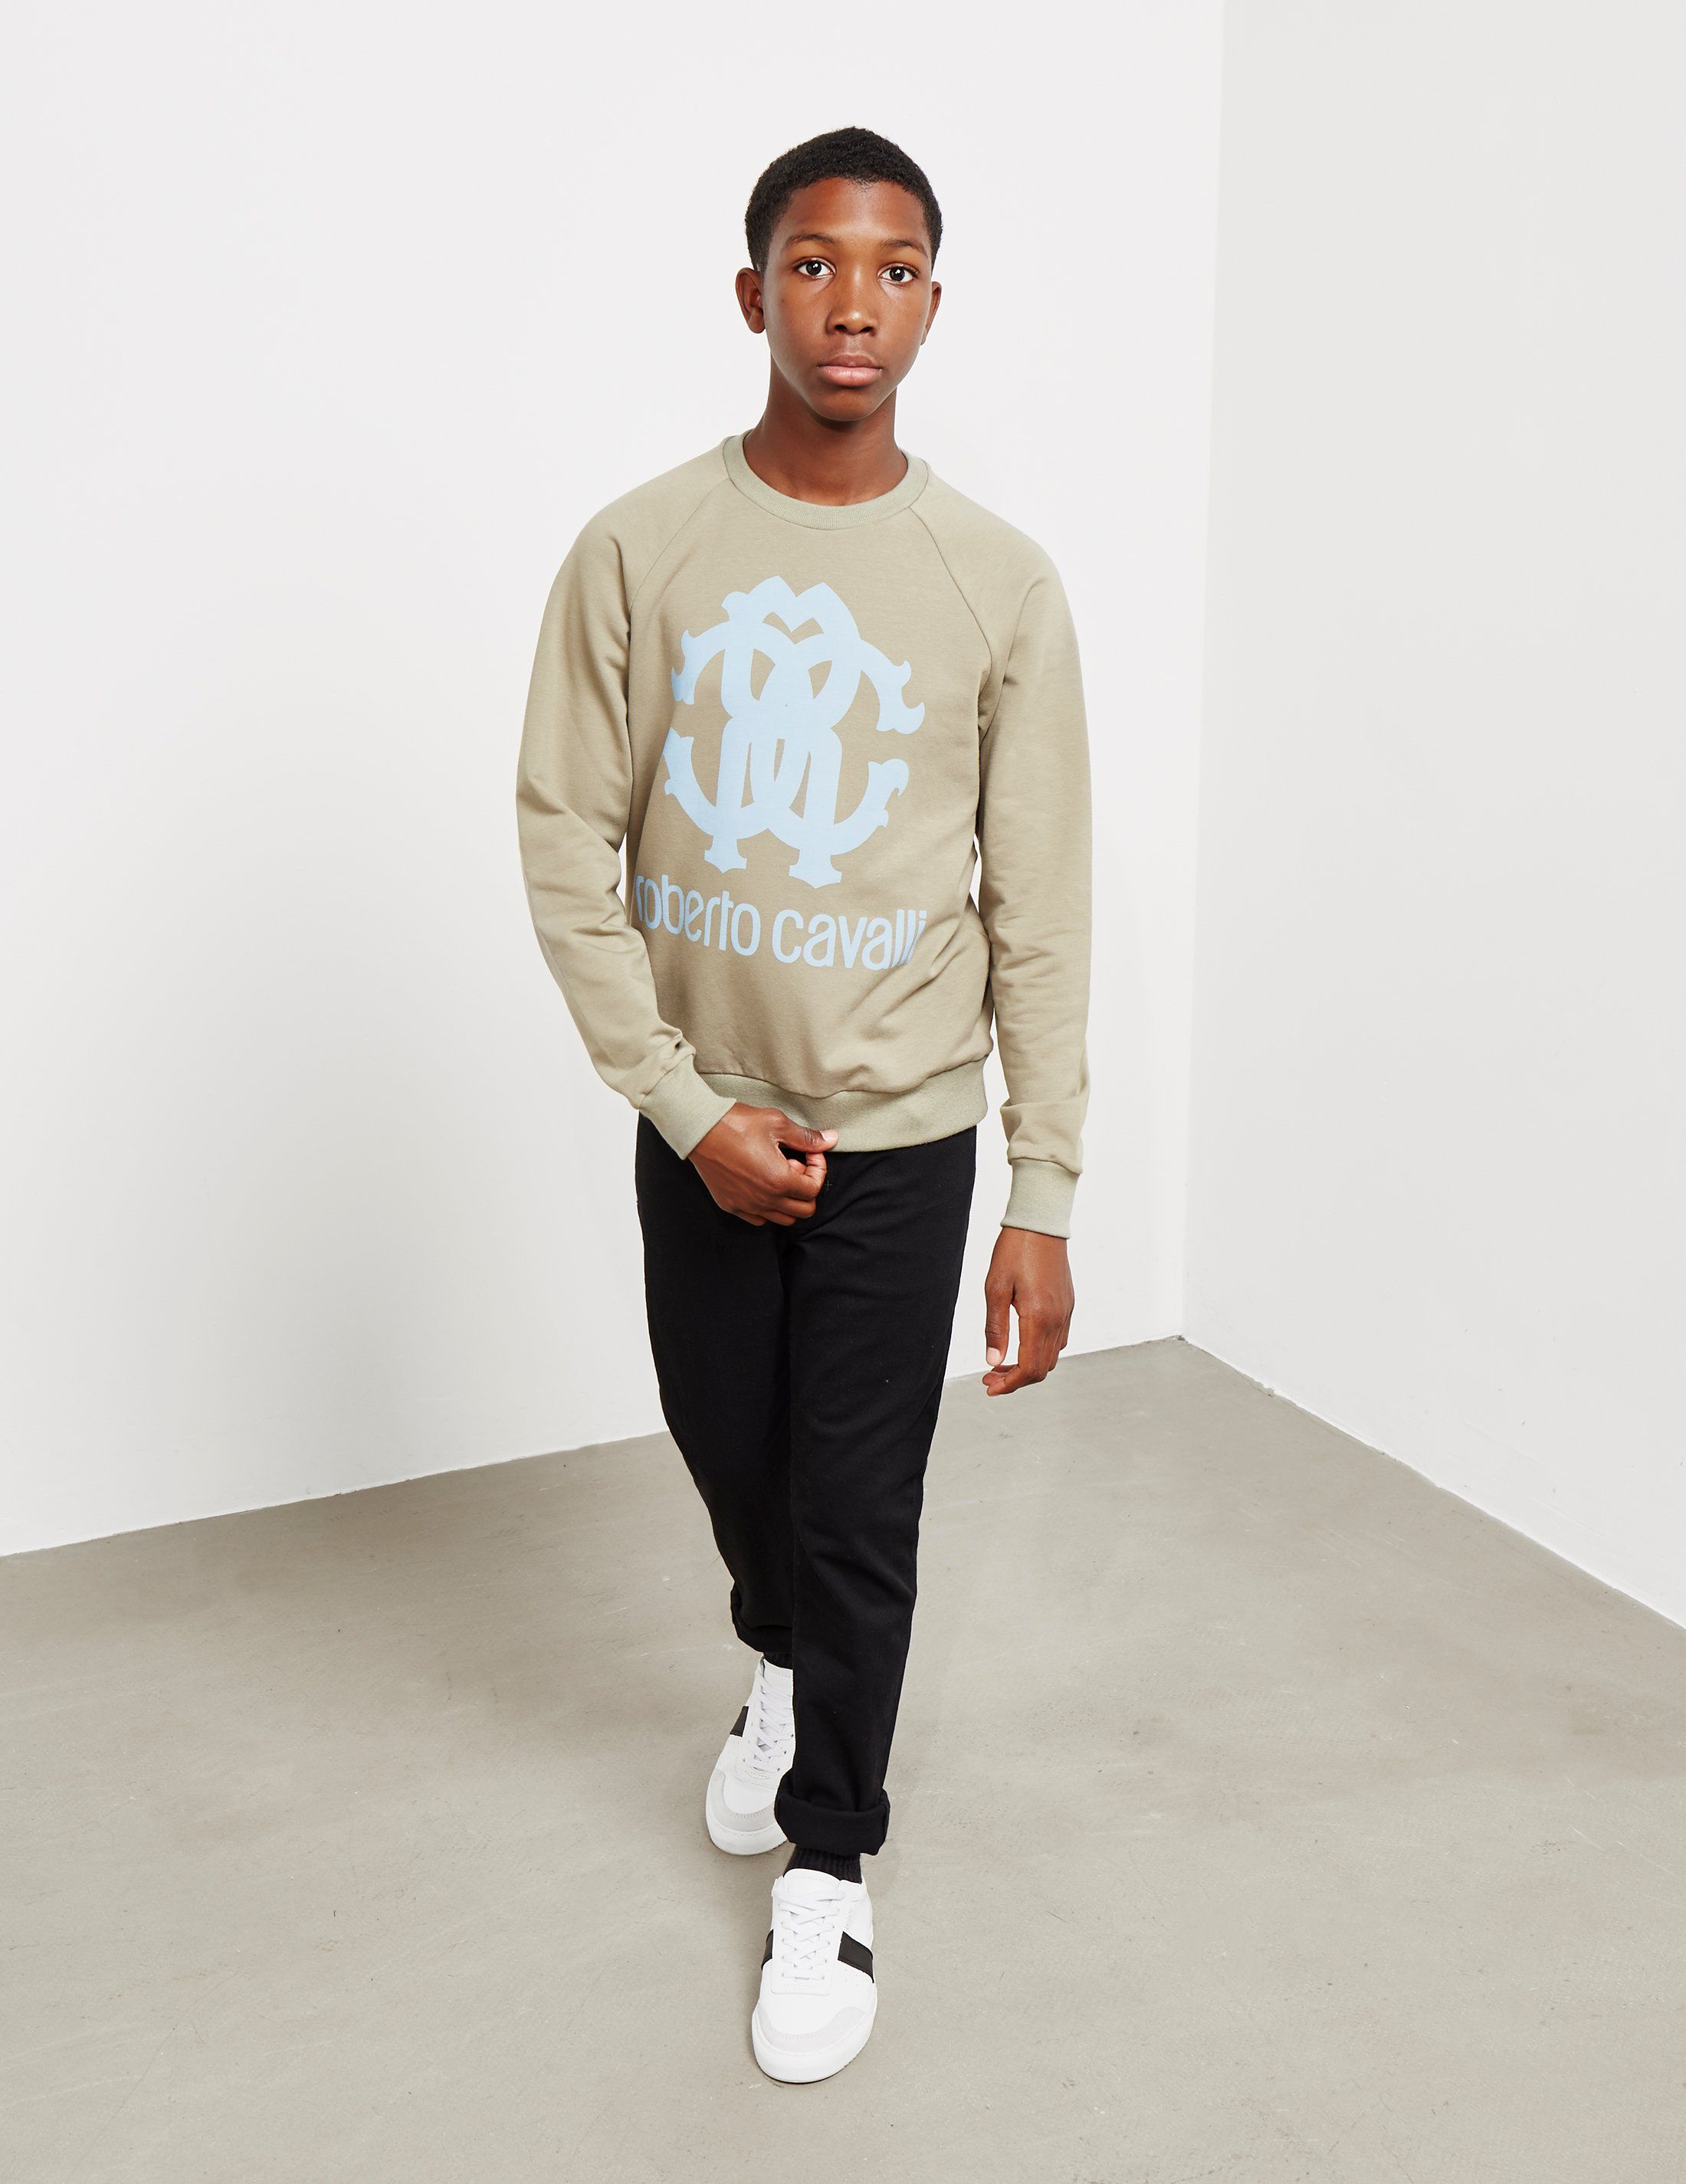 Roberto Cavalli Emblem Sweatshirt